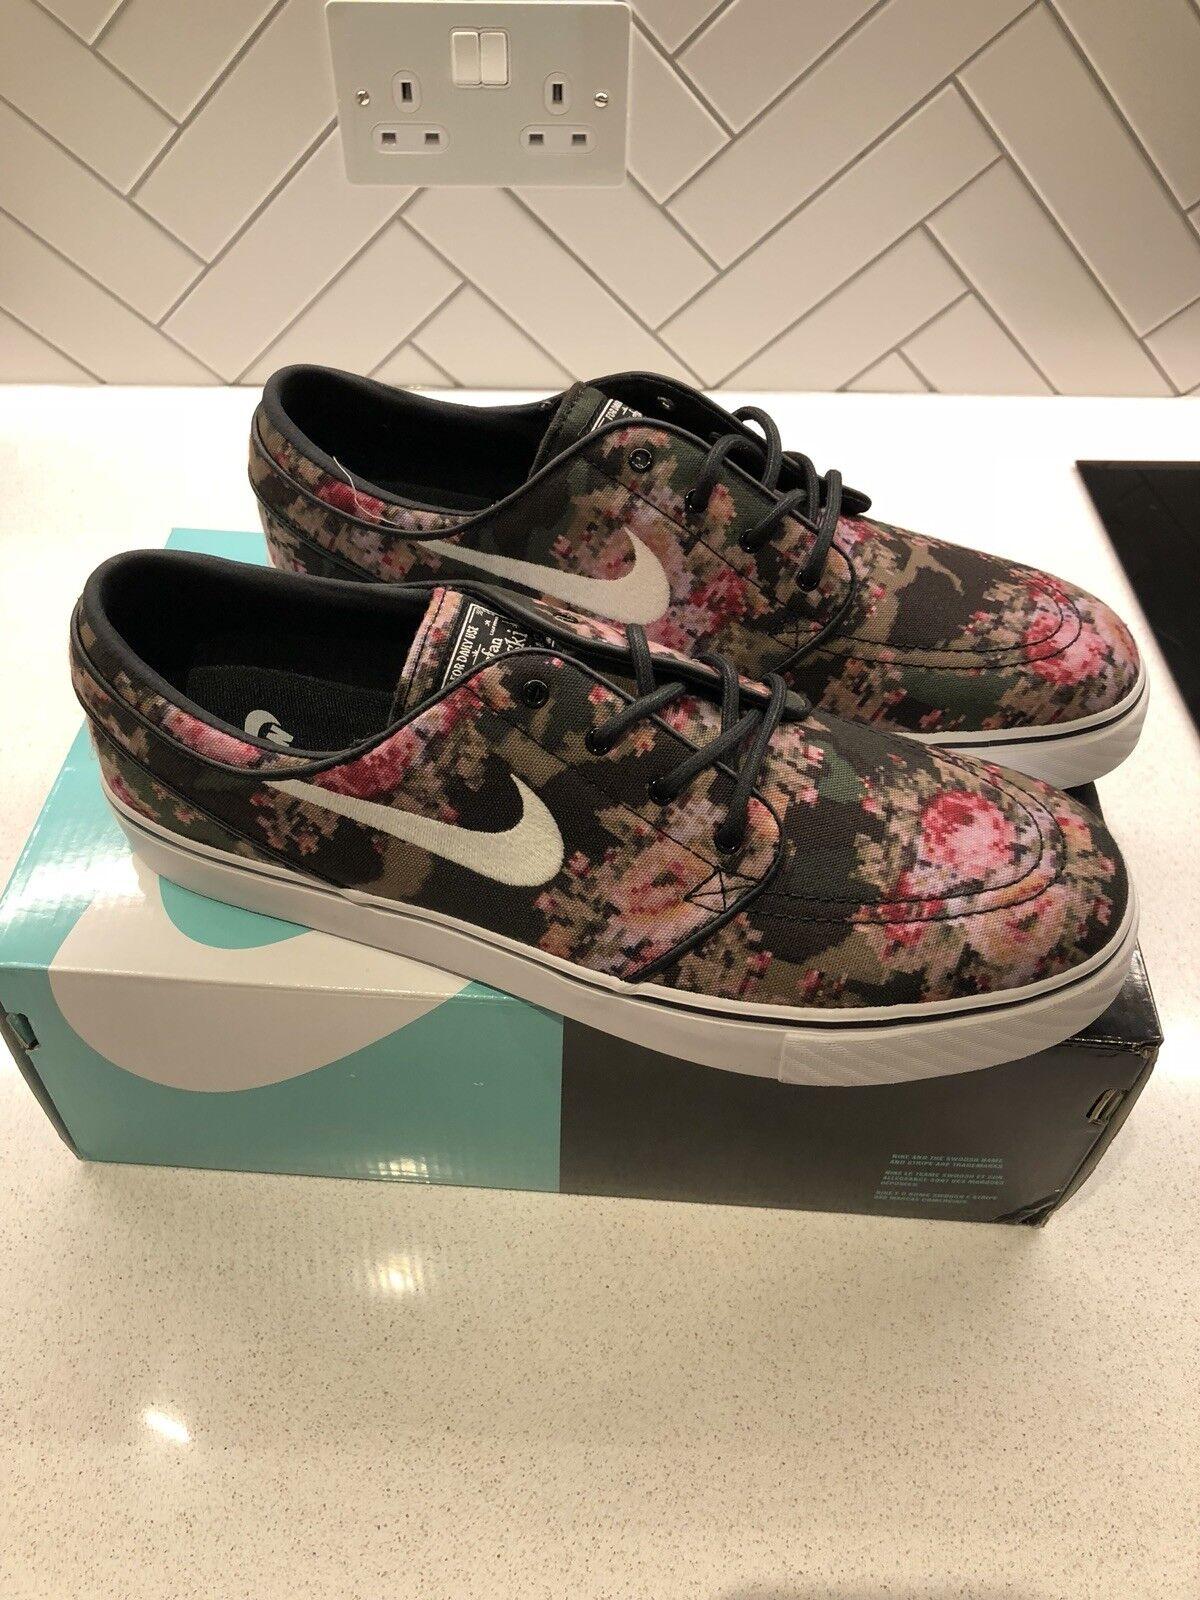 Nike Zoom Boarding Stefan Janoski PR Premium Digi Floral Skate Boarding Zoom chaussures uk 9.5 ea9f49